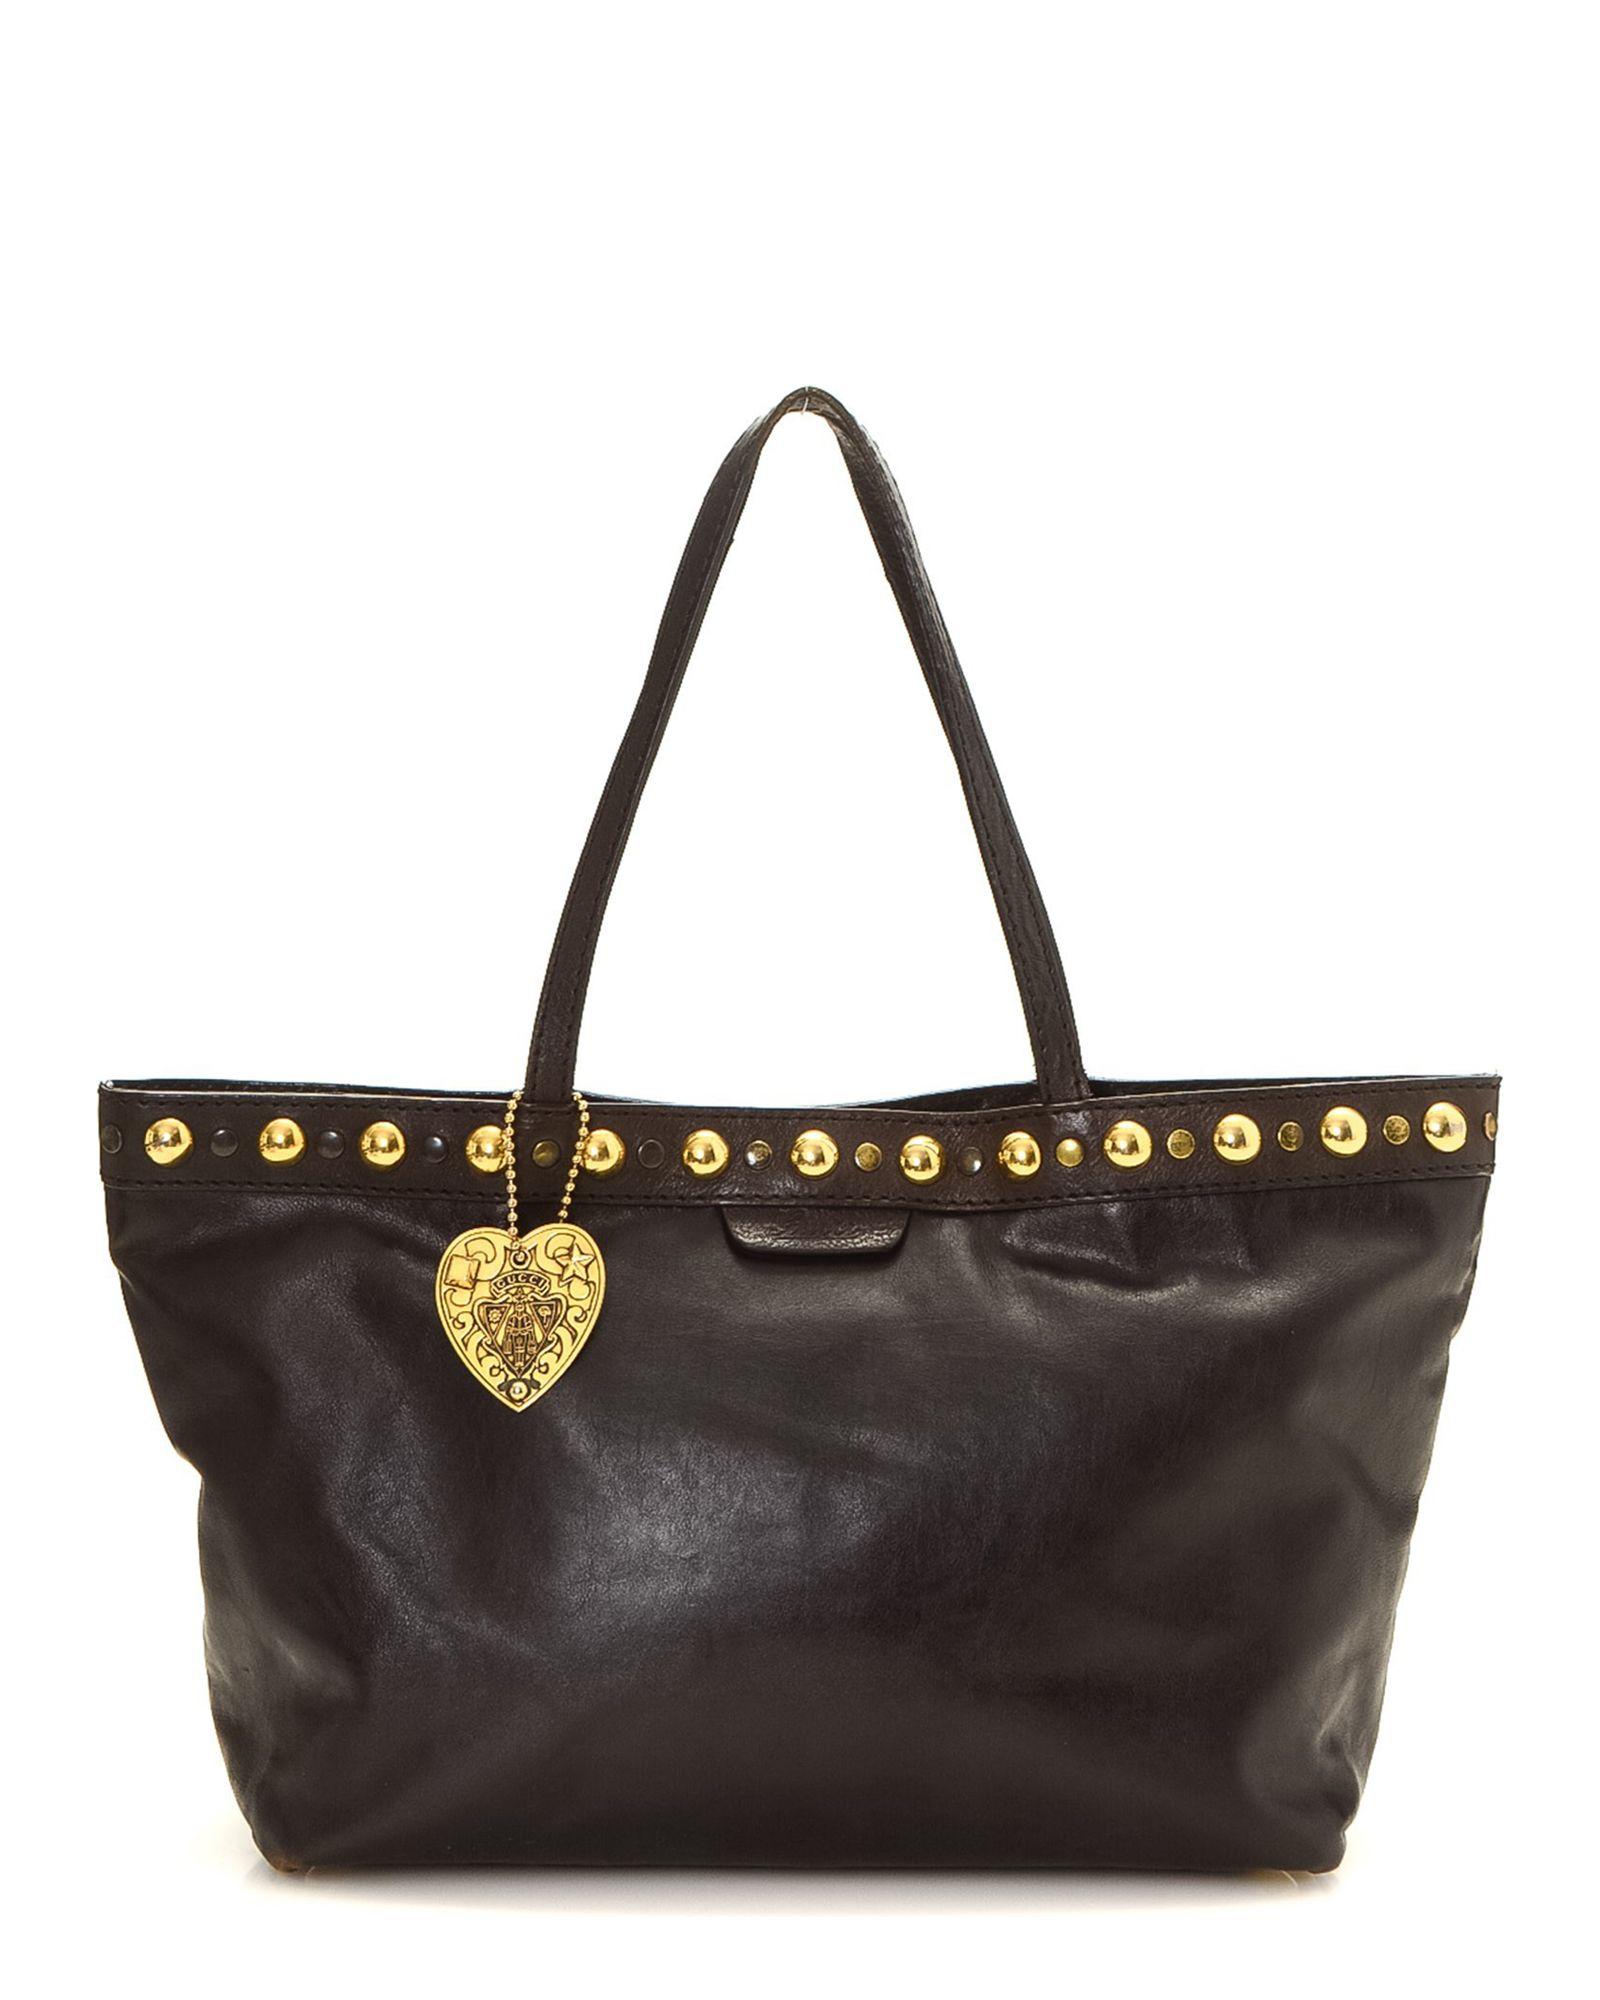 766c1d71a9a6 Gucci Babouska Tote - Vintage | *Century 21 Stores* | Tote Bag, Bags ...